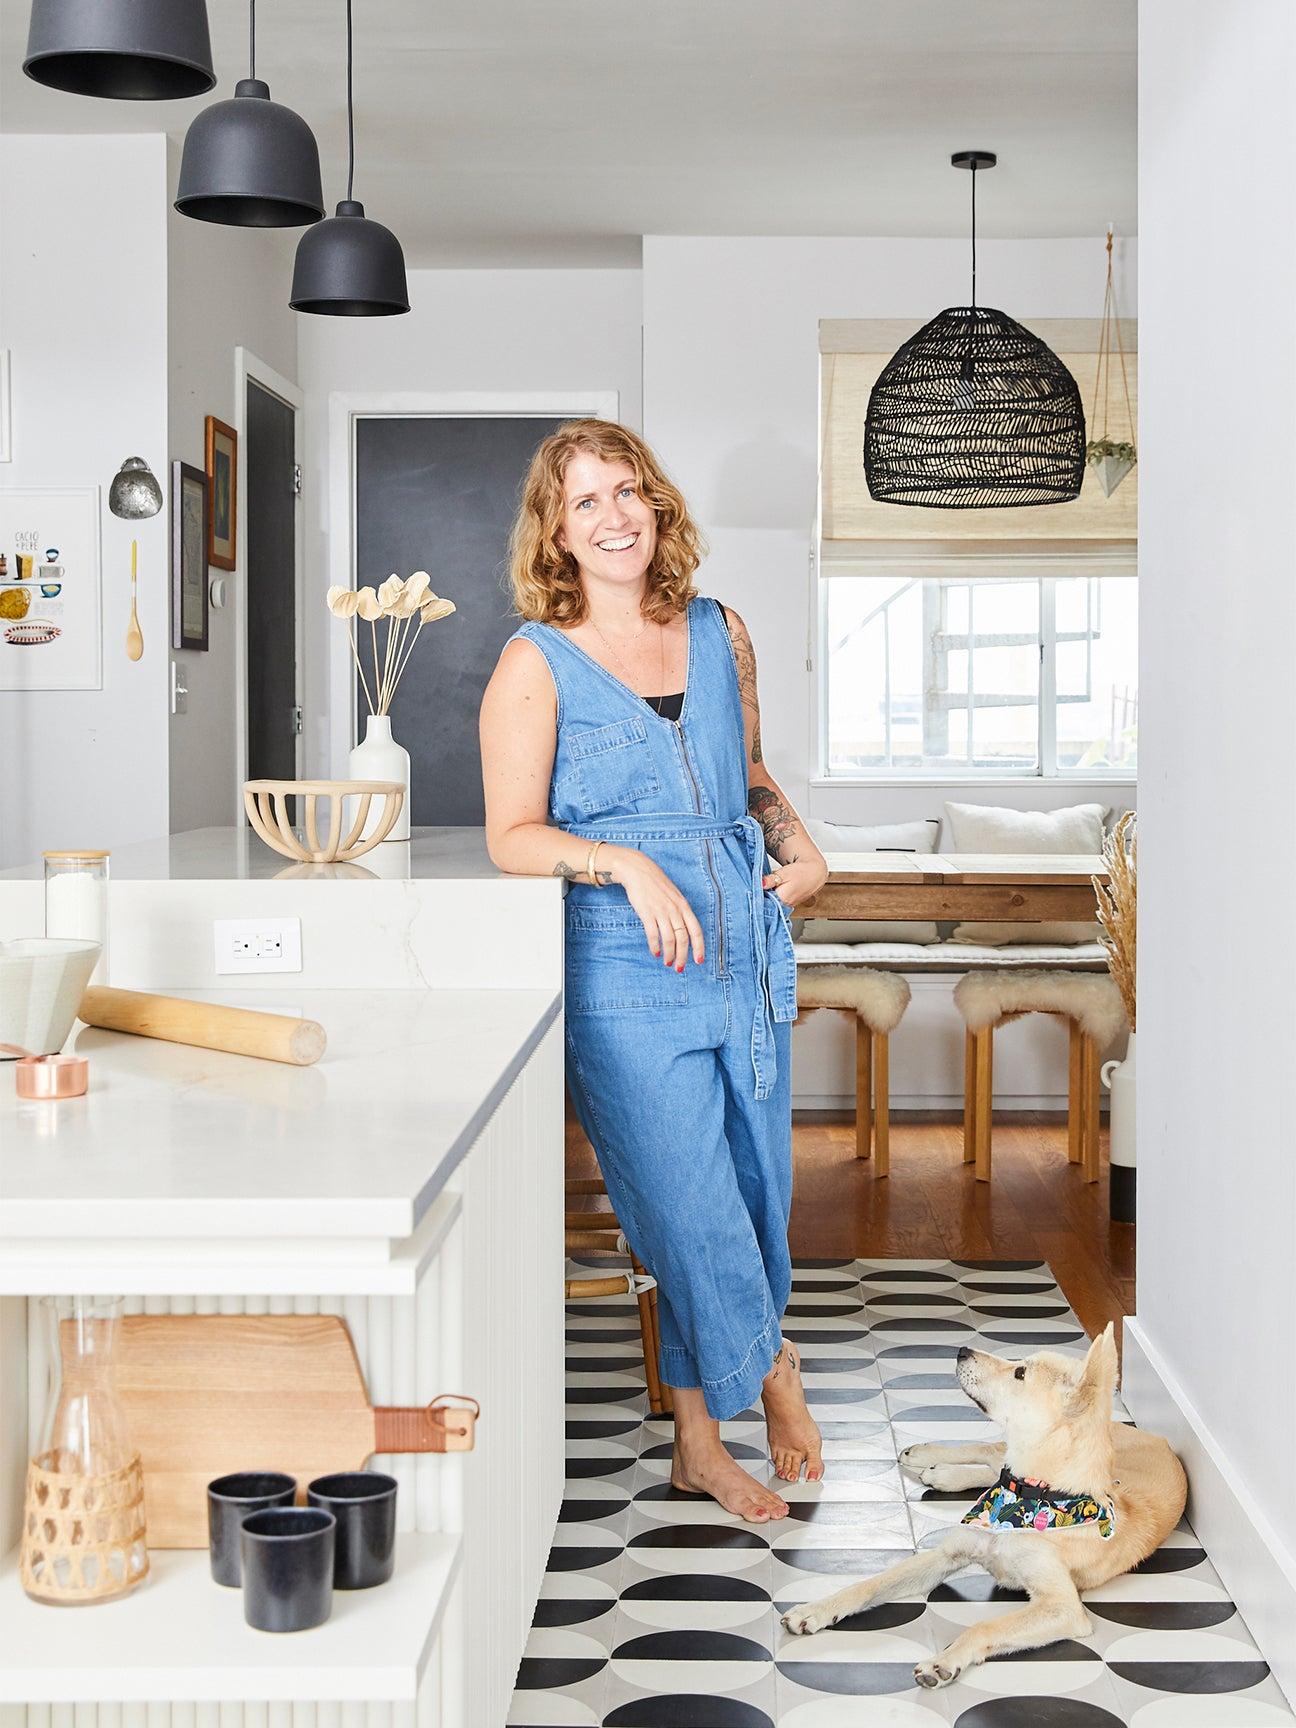 Every Nook Has Hidden Storage in This Brooklyn Baker's Kitchen